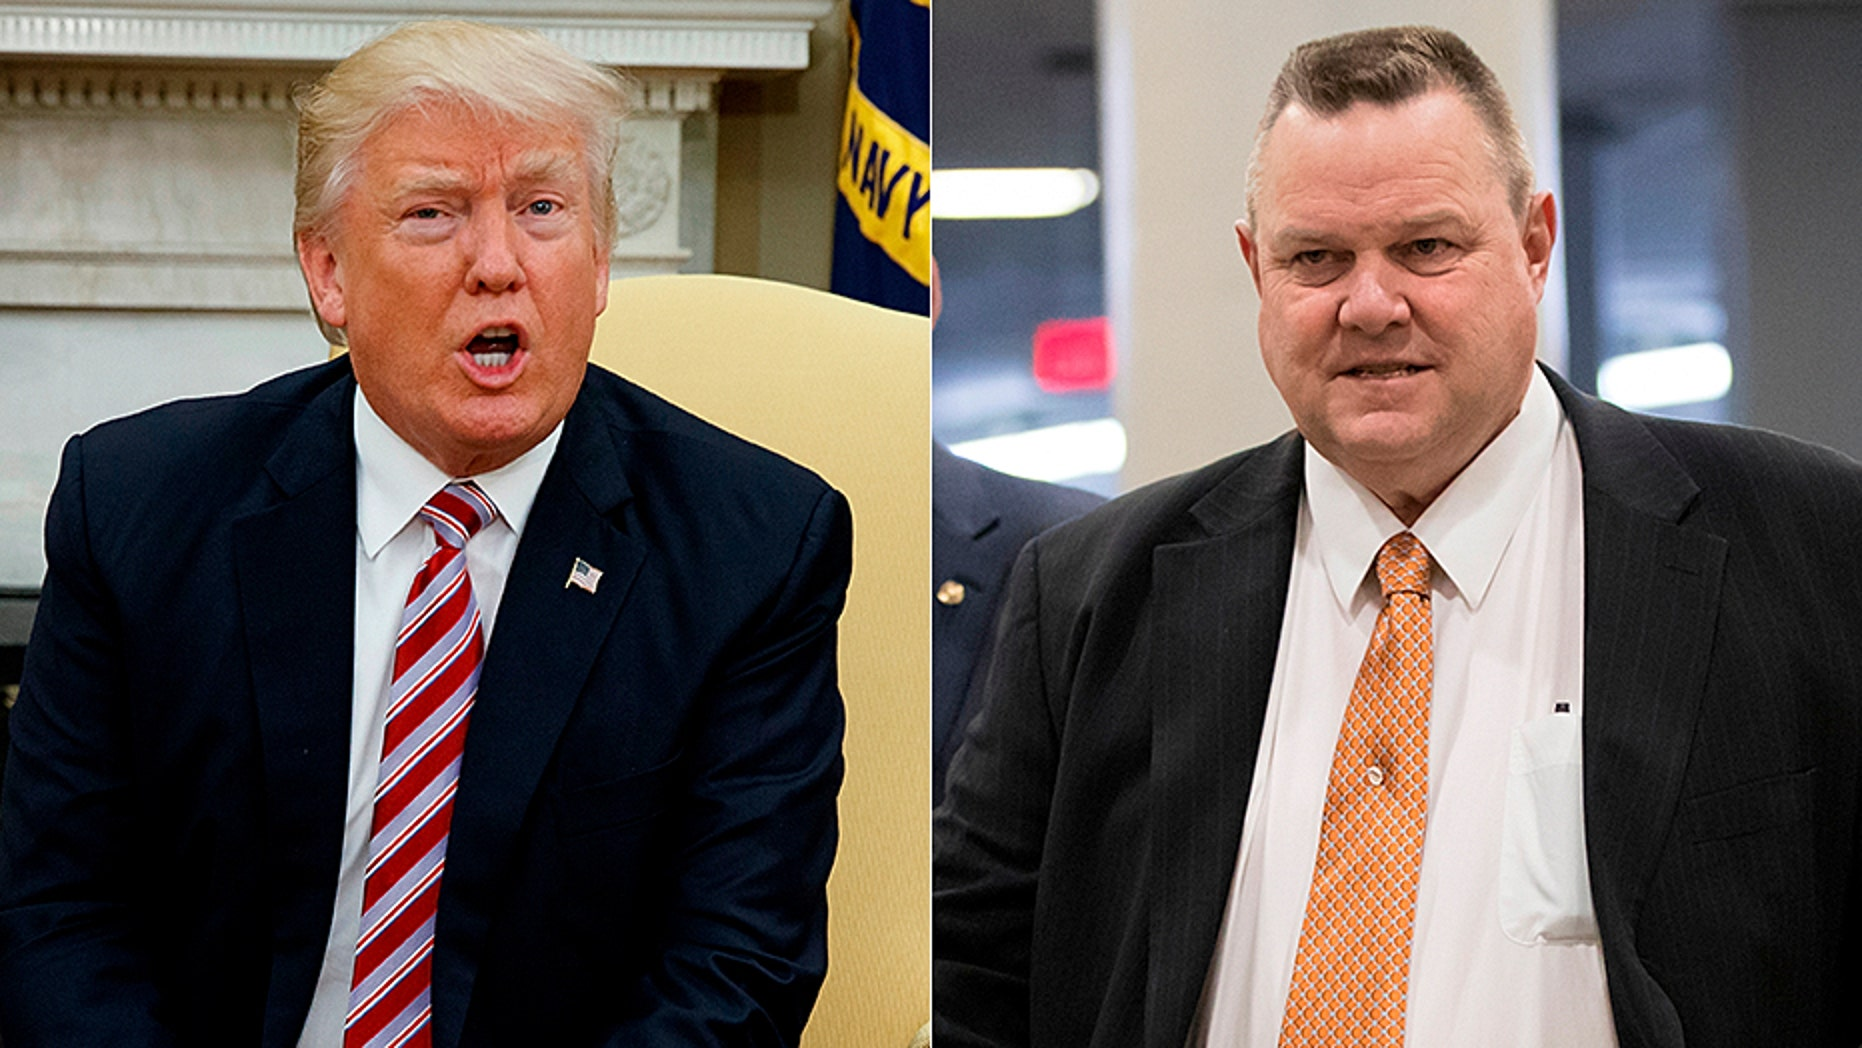 President Trump is making life difficult for Montana Sen. Jon Tester, right.